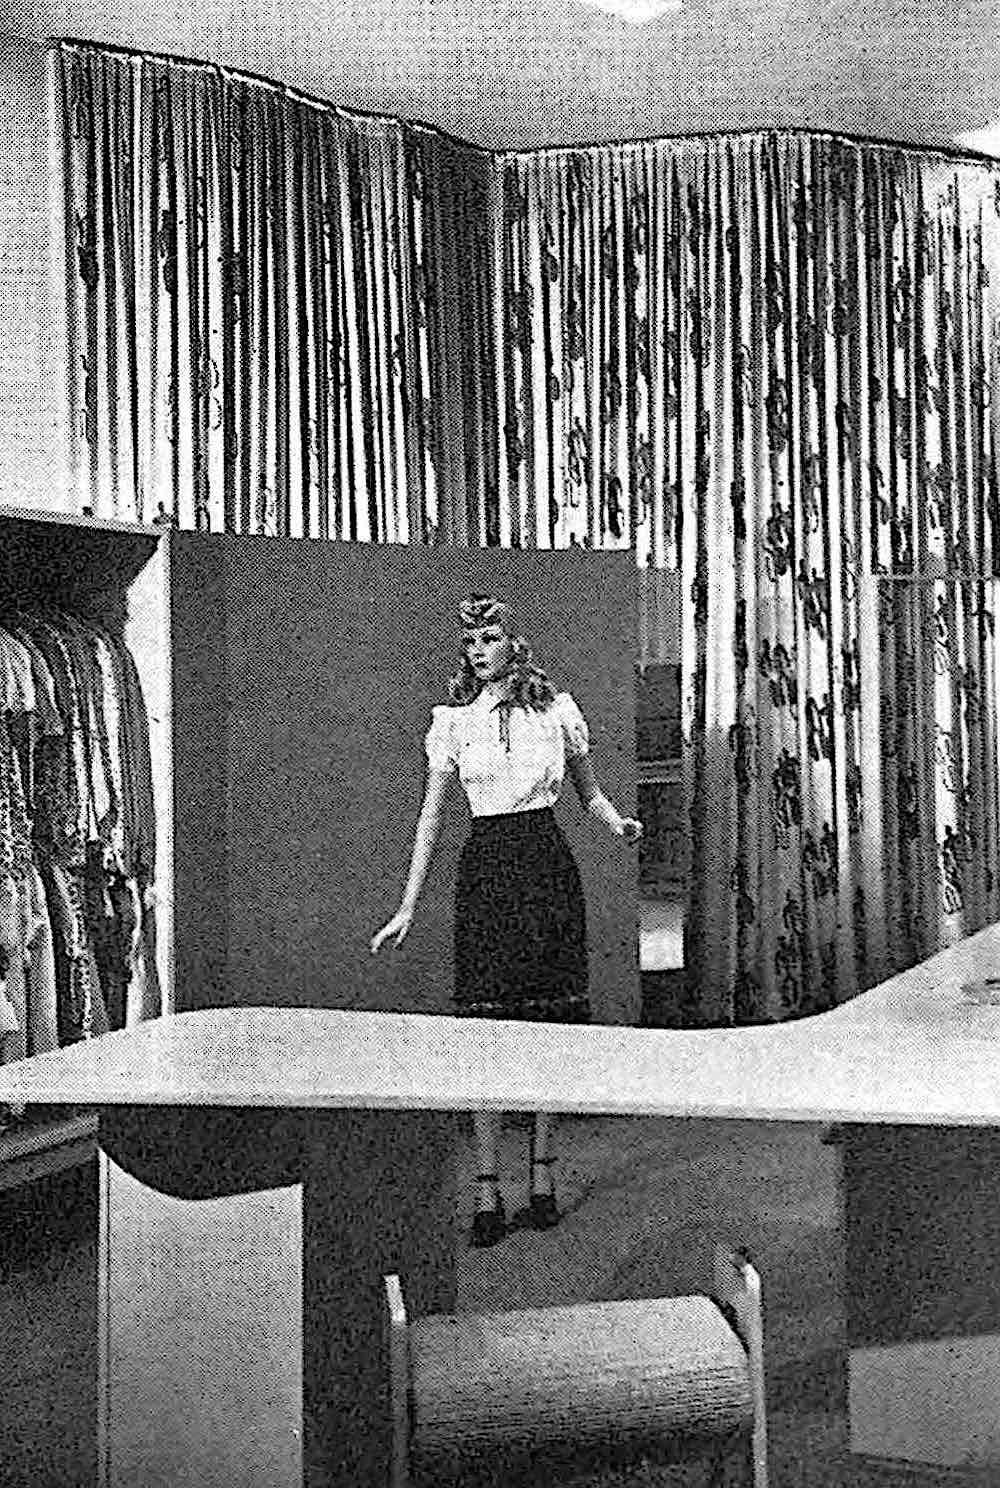 1945 store mannequin odd photograph